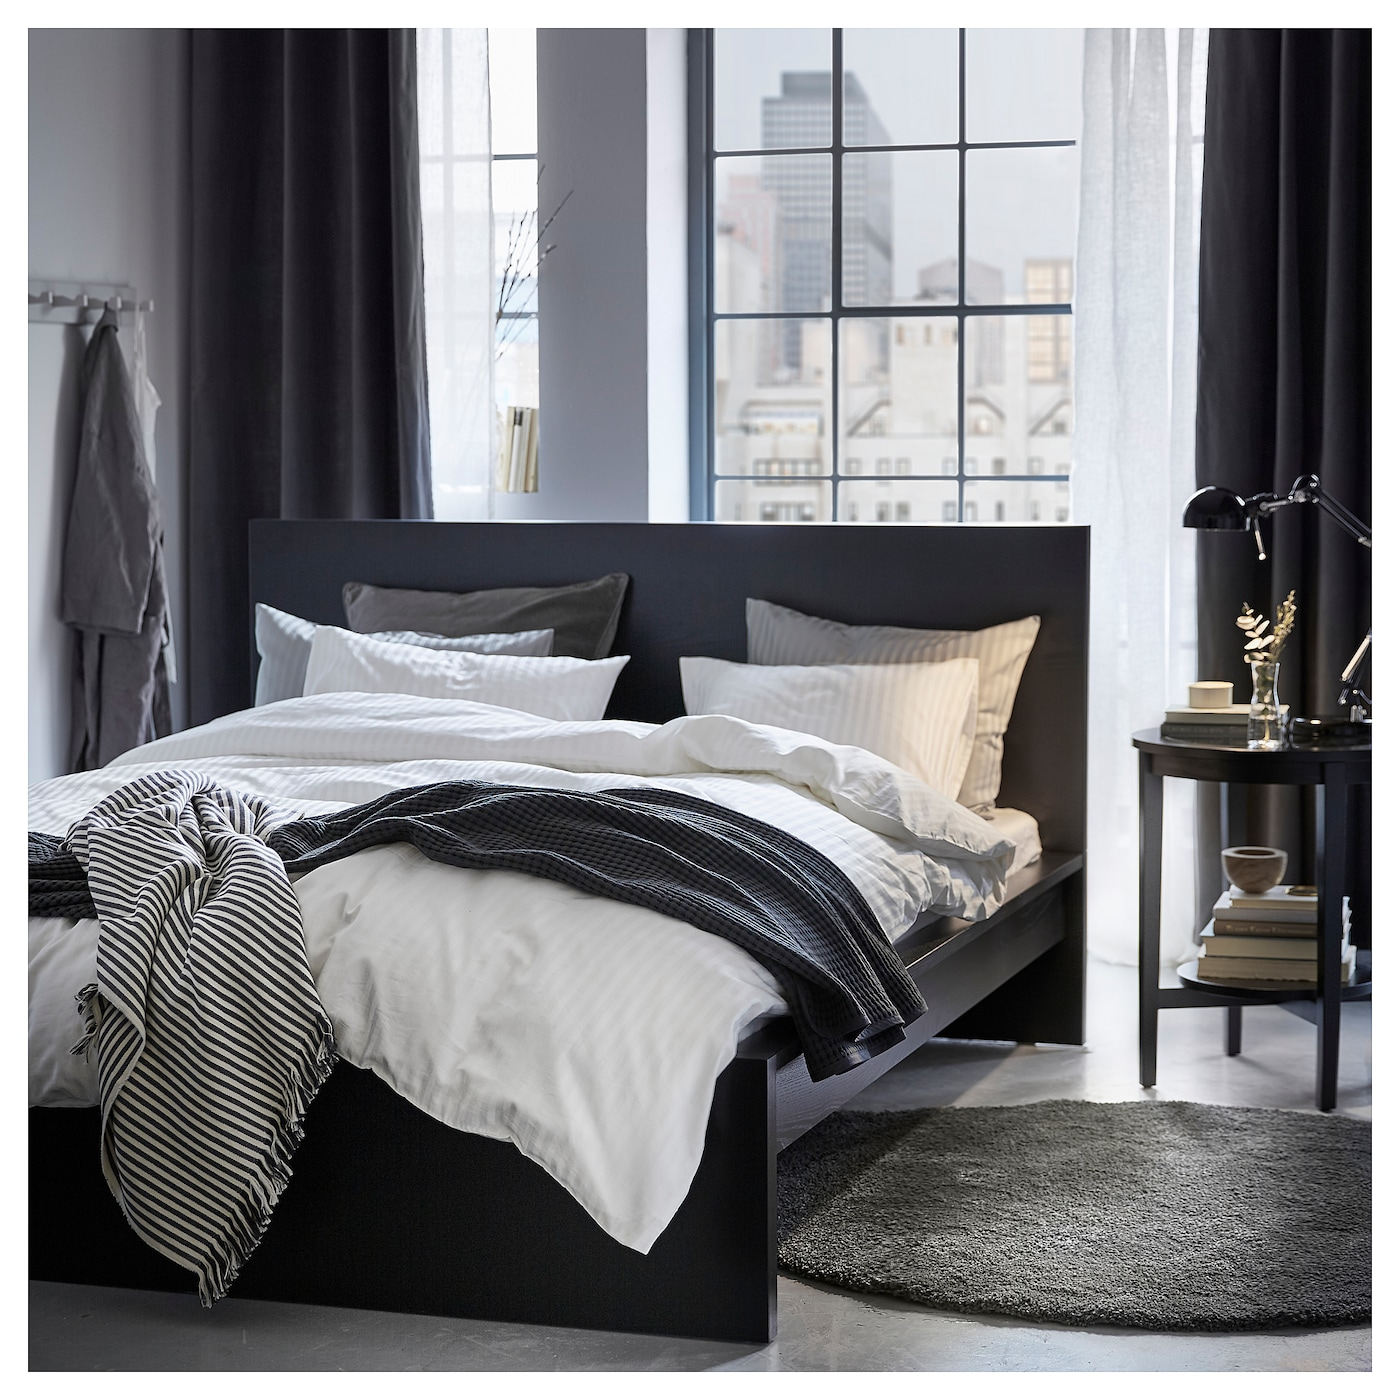 NATTJASMIN Quilt cover and 6 pillowcases - white 640x660/6x6 cm